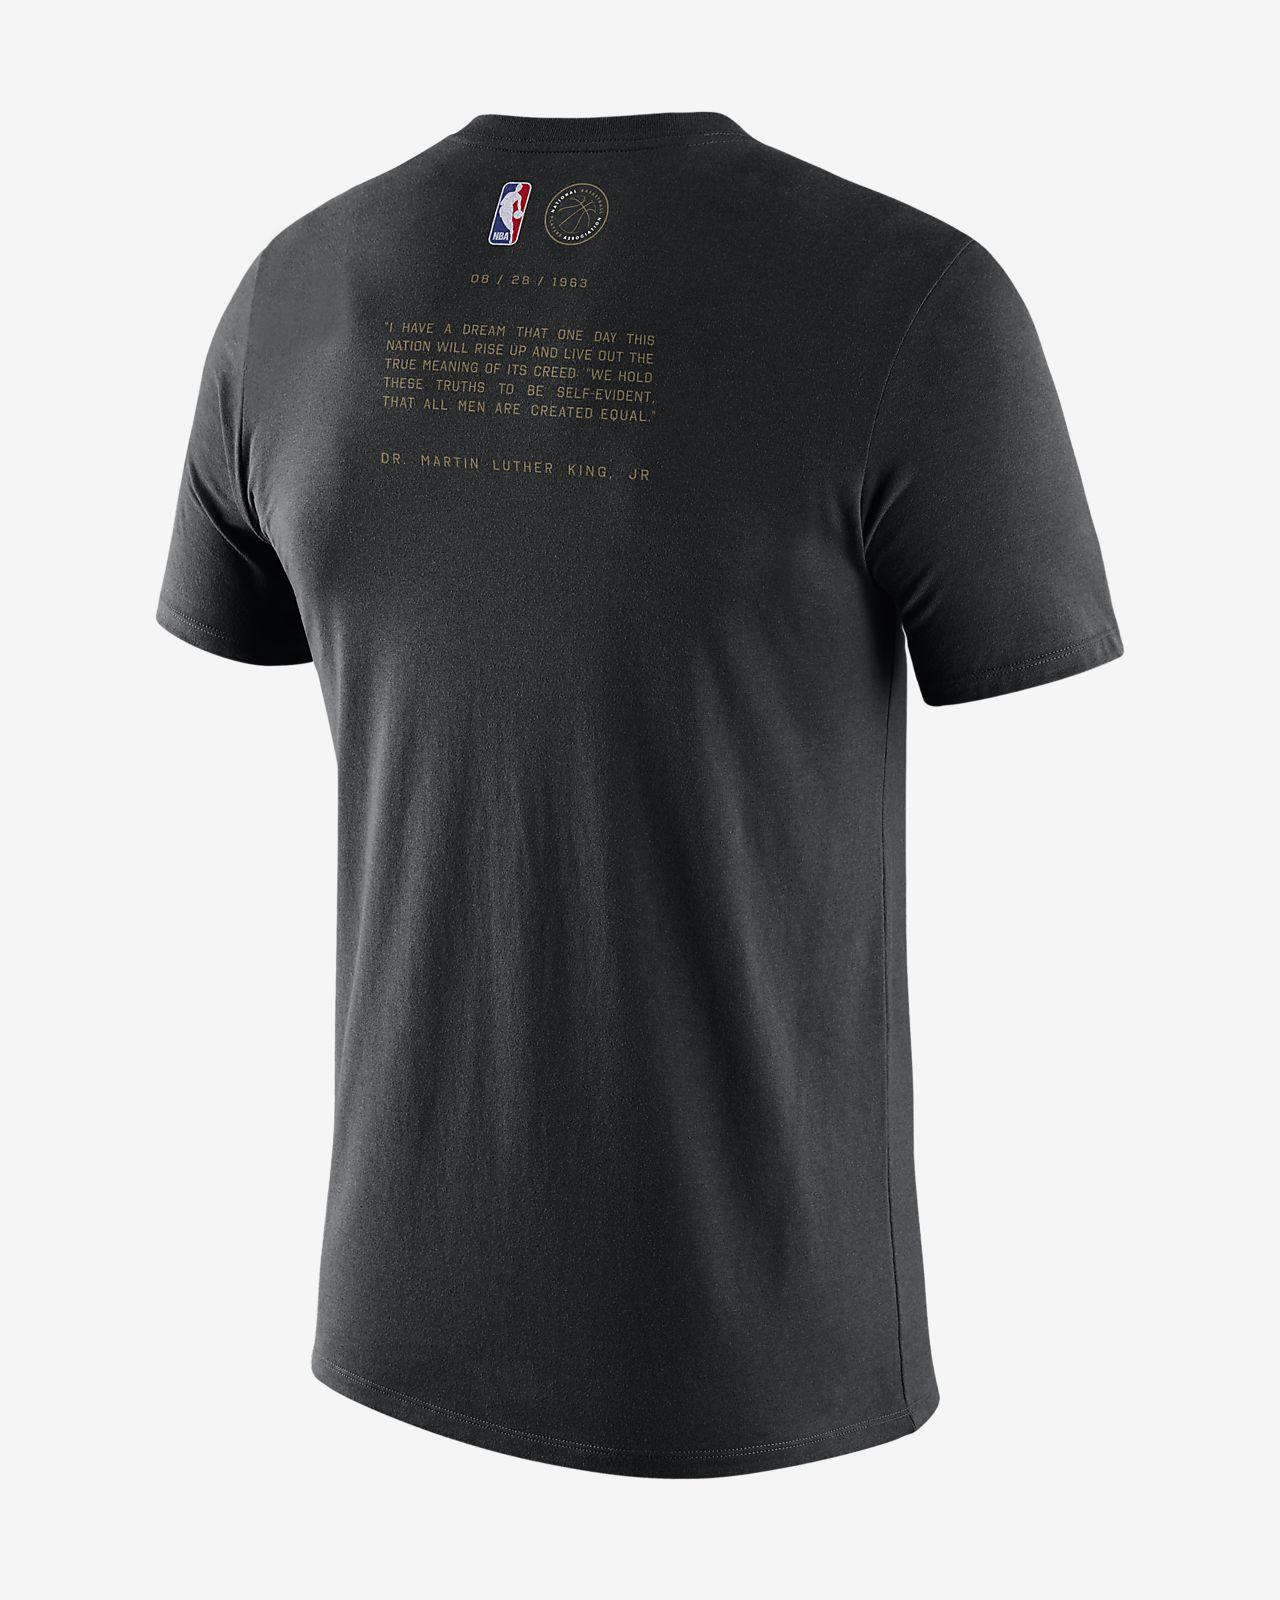 all black nike shirt